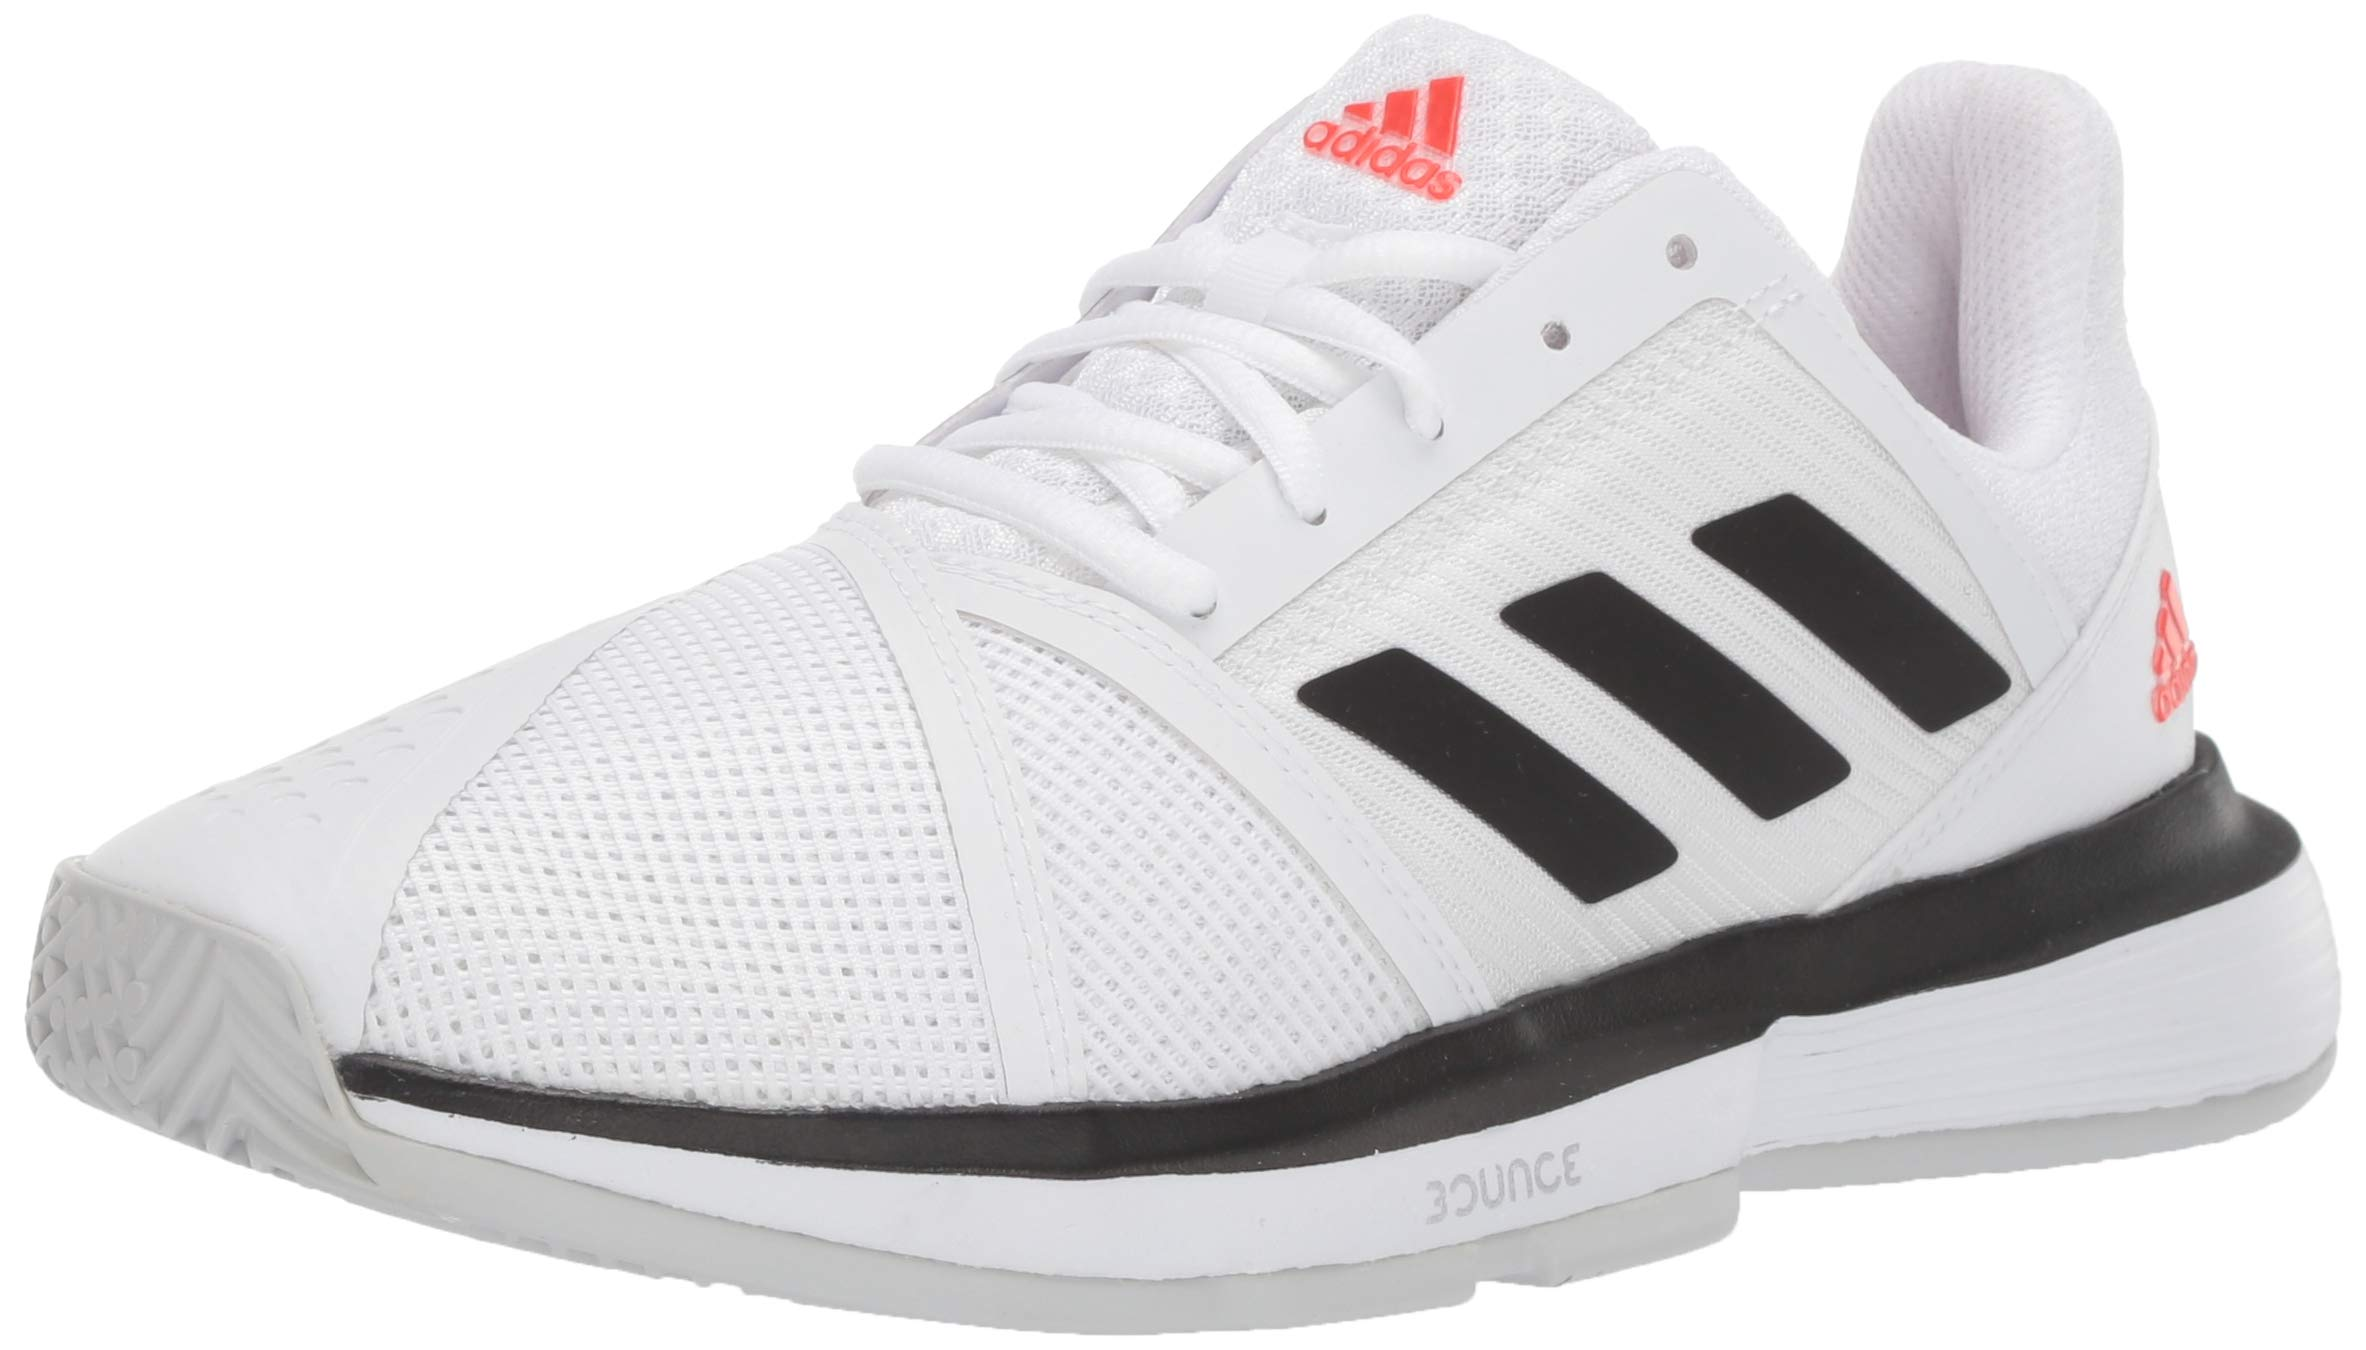 adidas Men's CourtJam Bounce Tennis Shoe, White/Black/Light Grey Heather, 6.5 M US